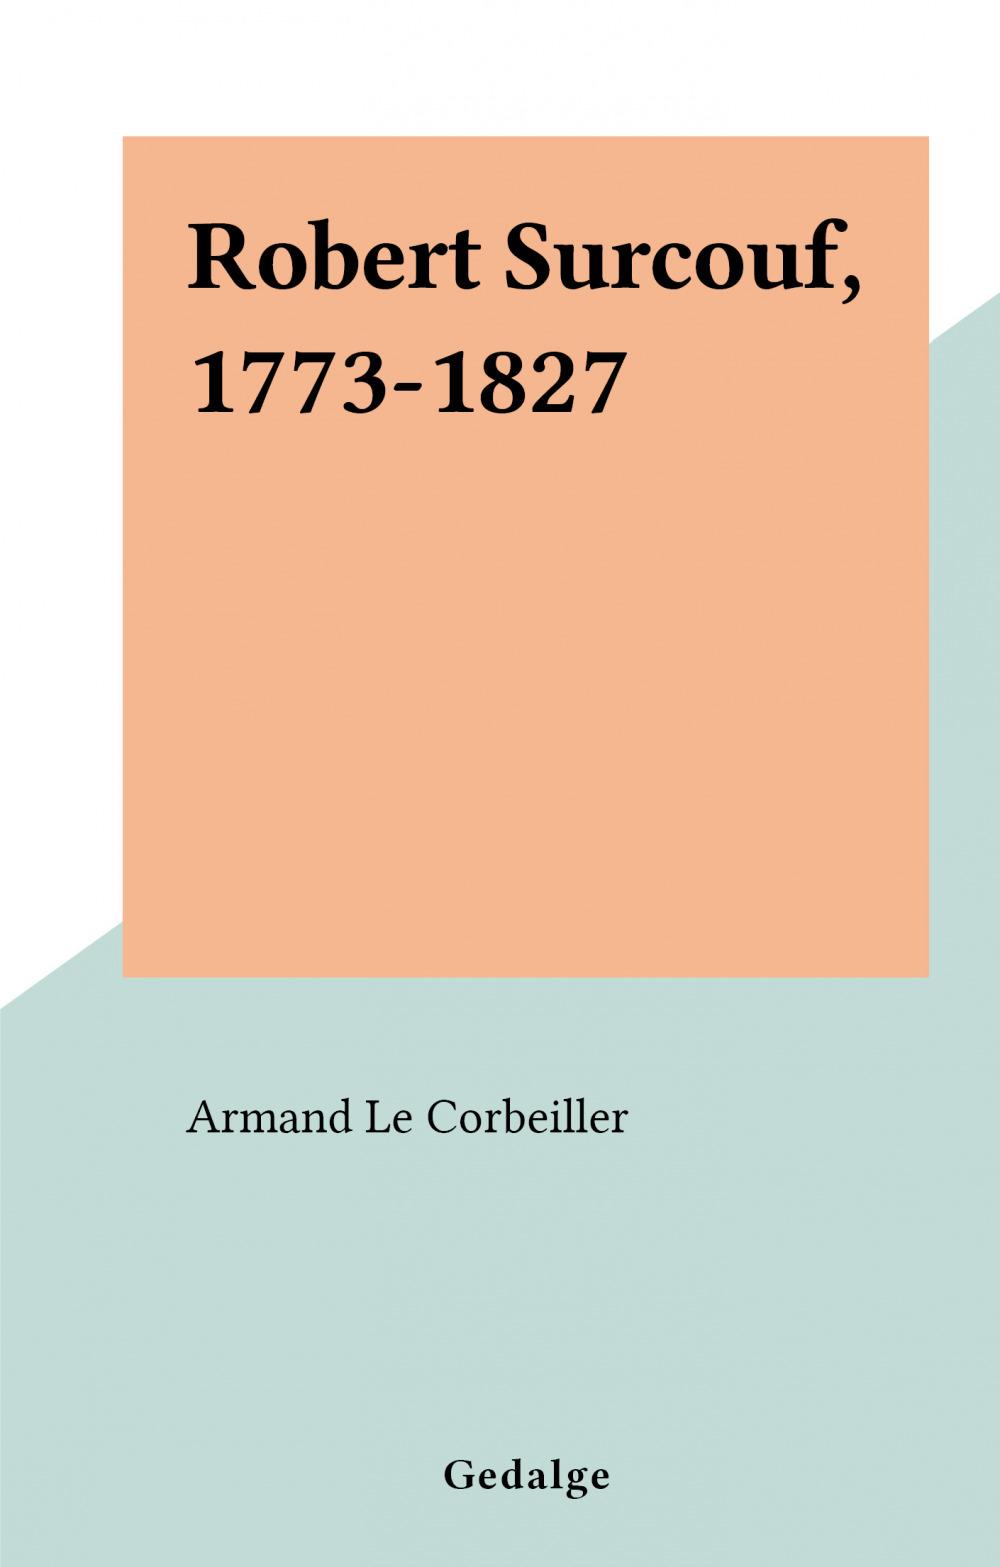 Robert Surcouf, 1773-1827